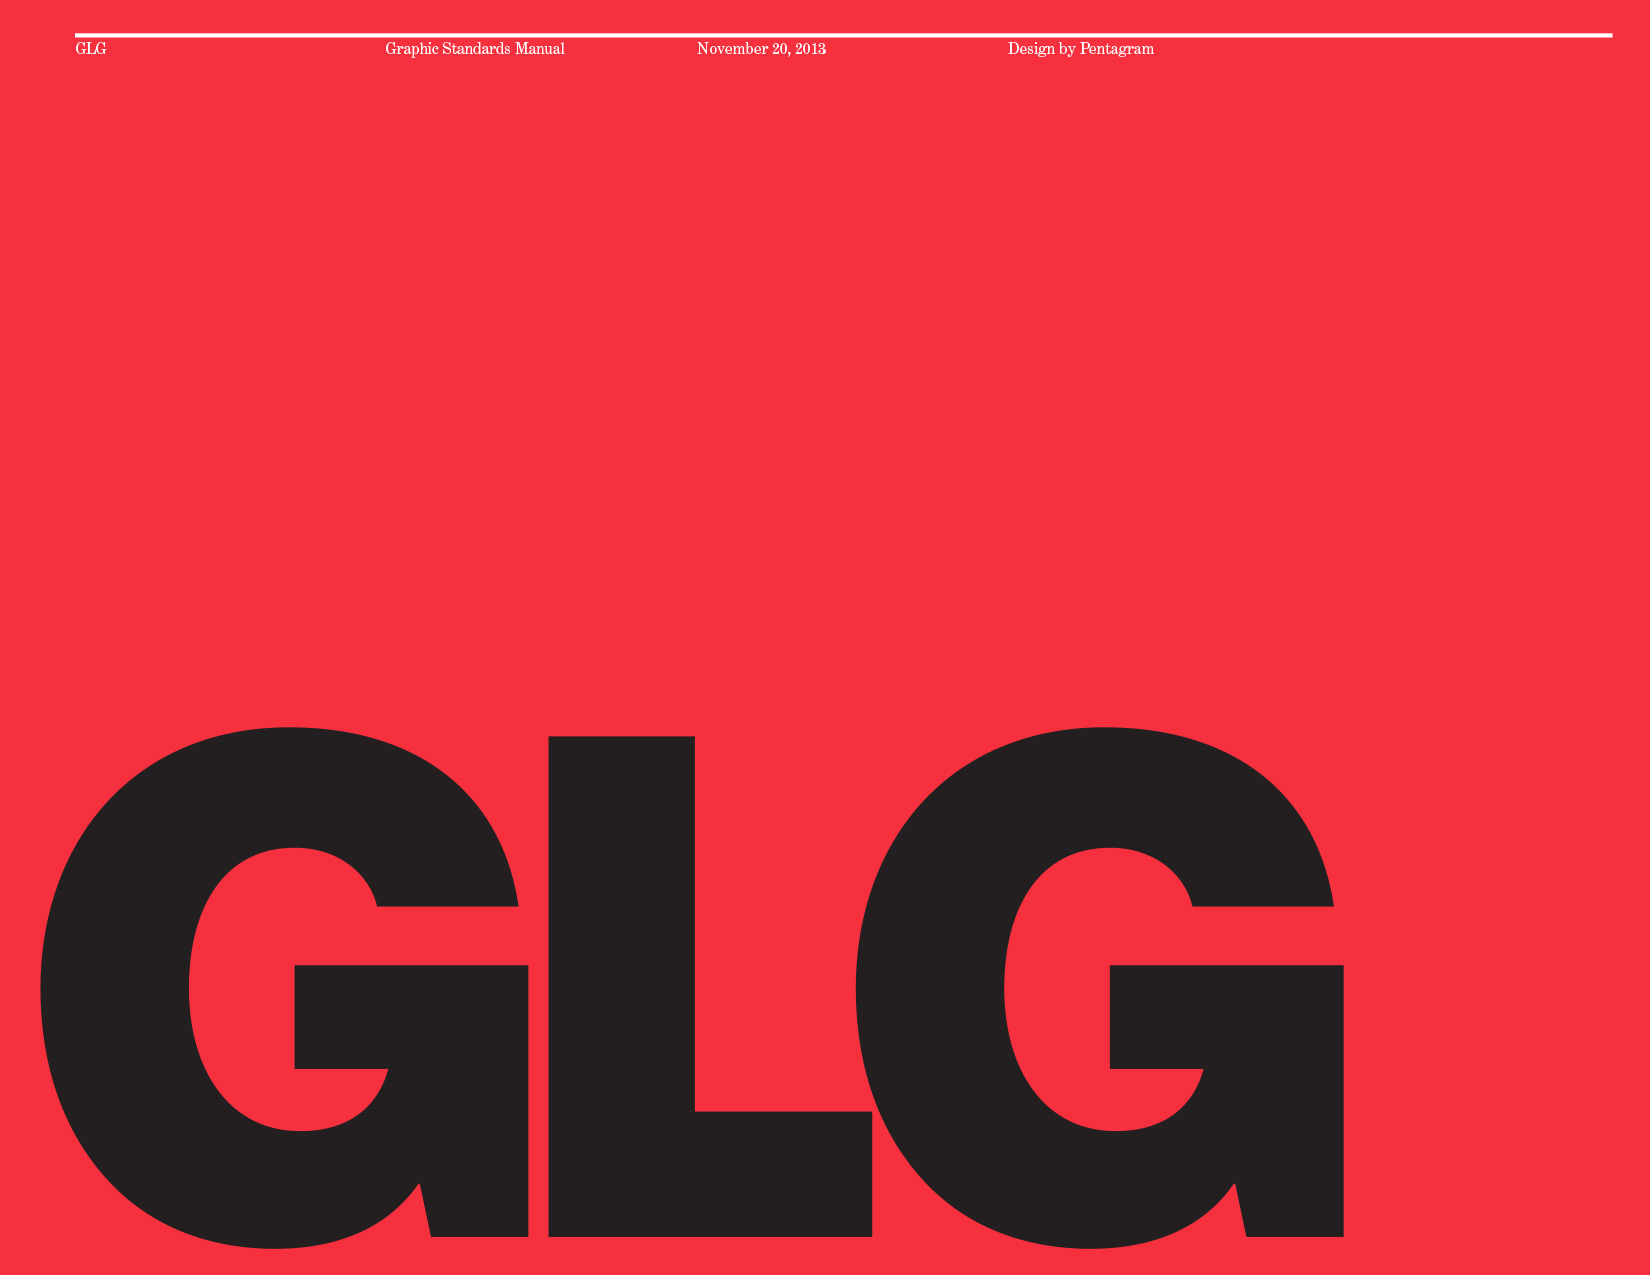 GLG_StandardsManual_131120_02-1.jpg